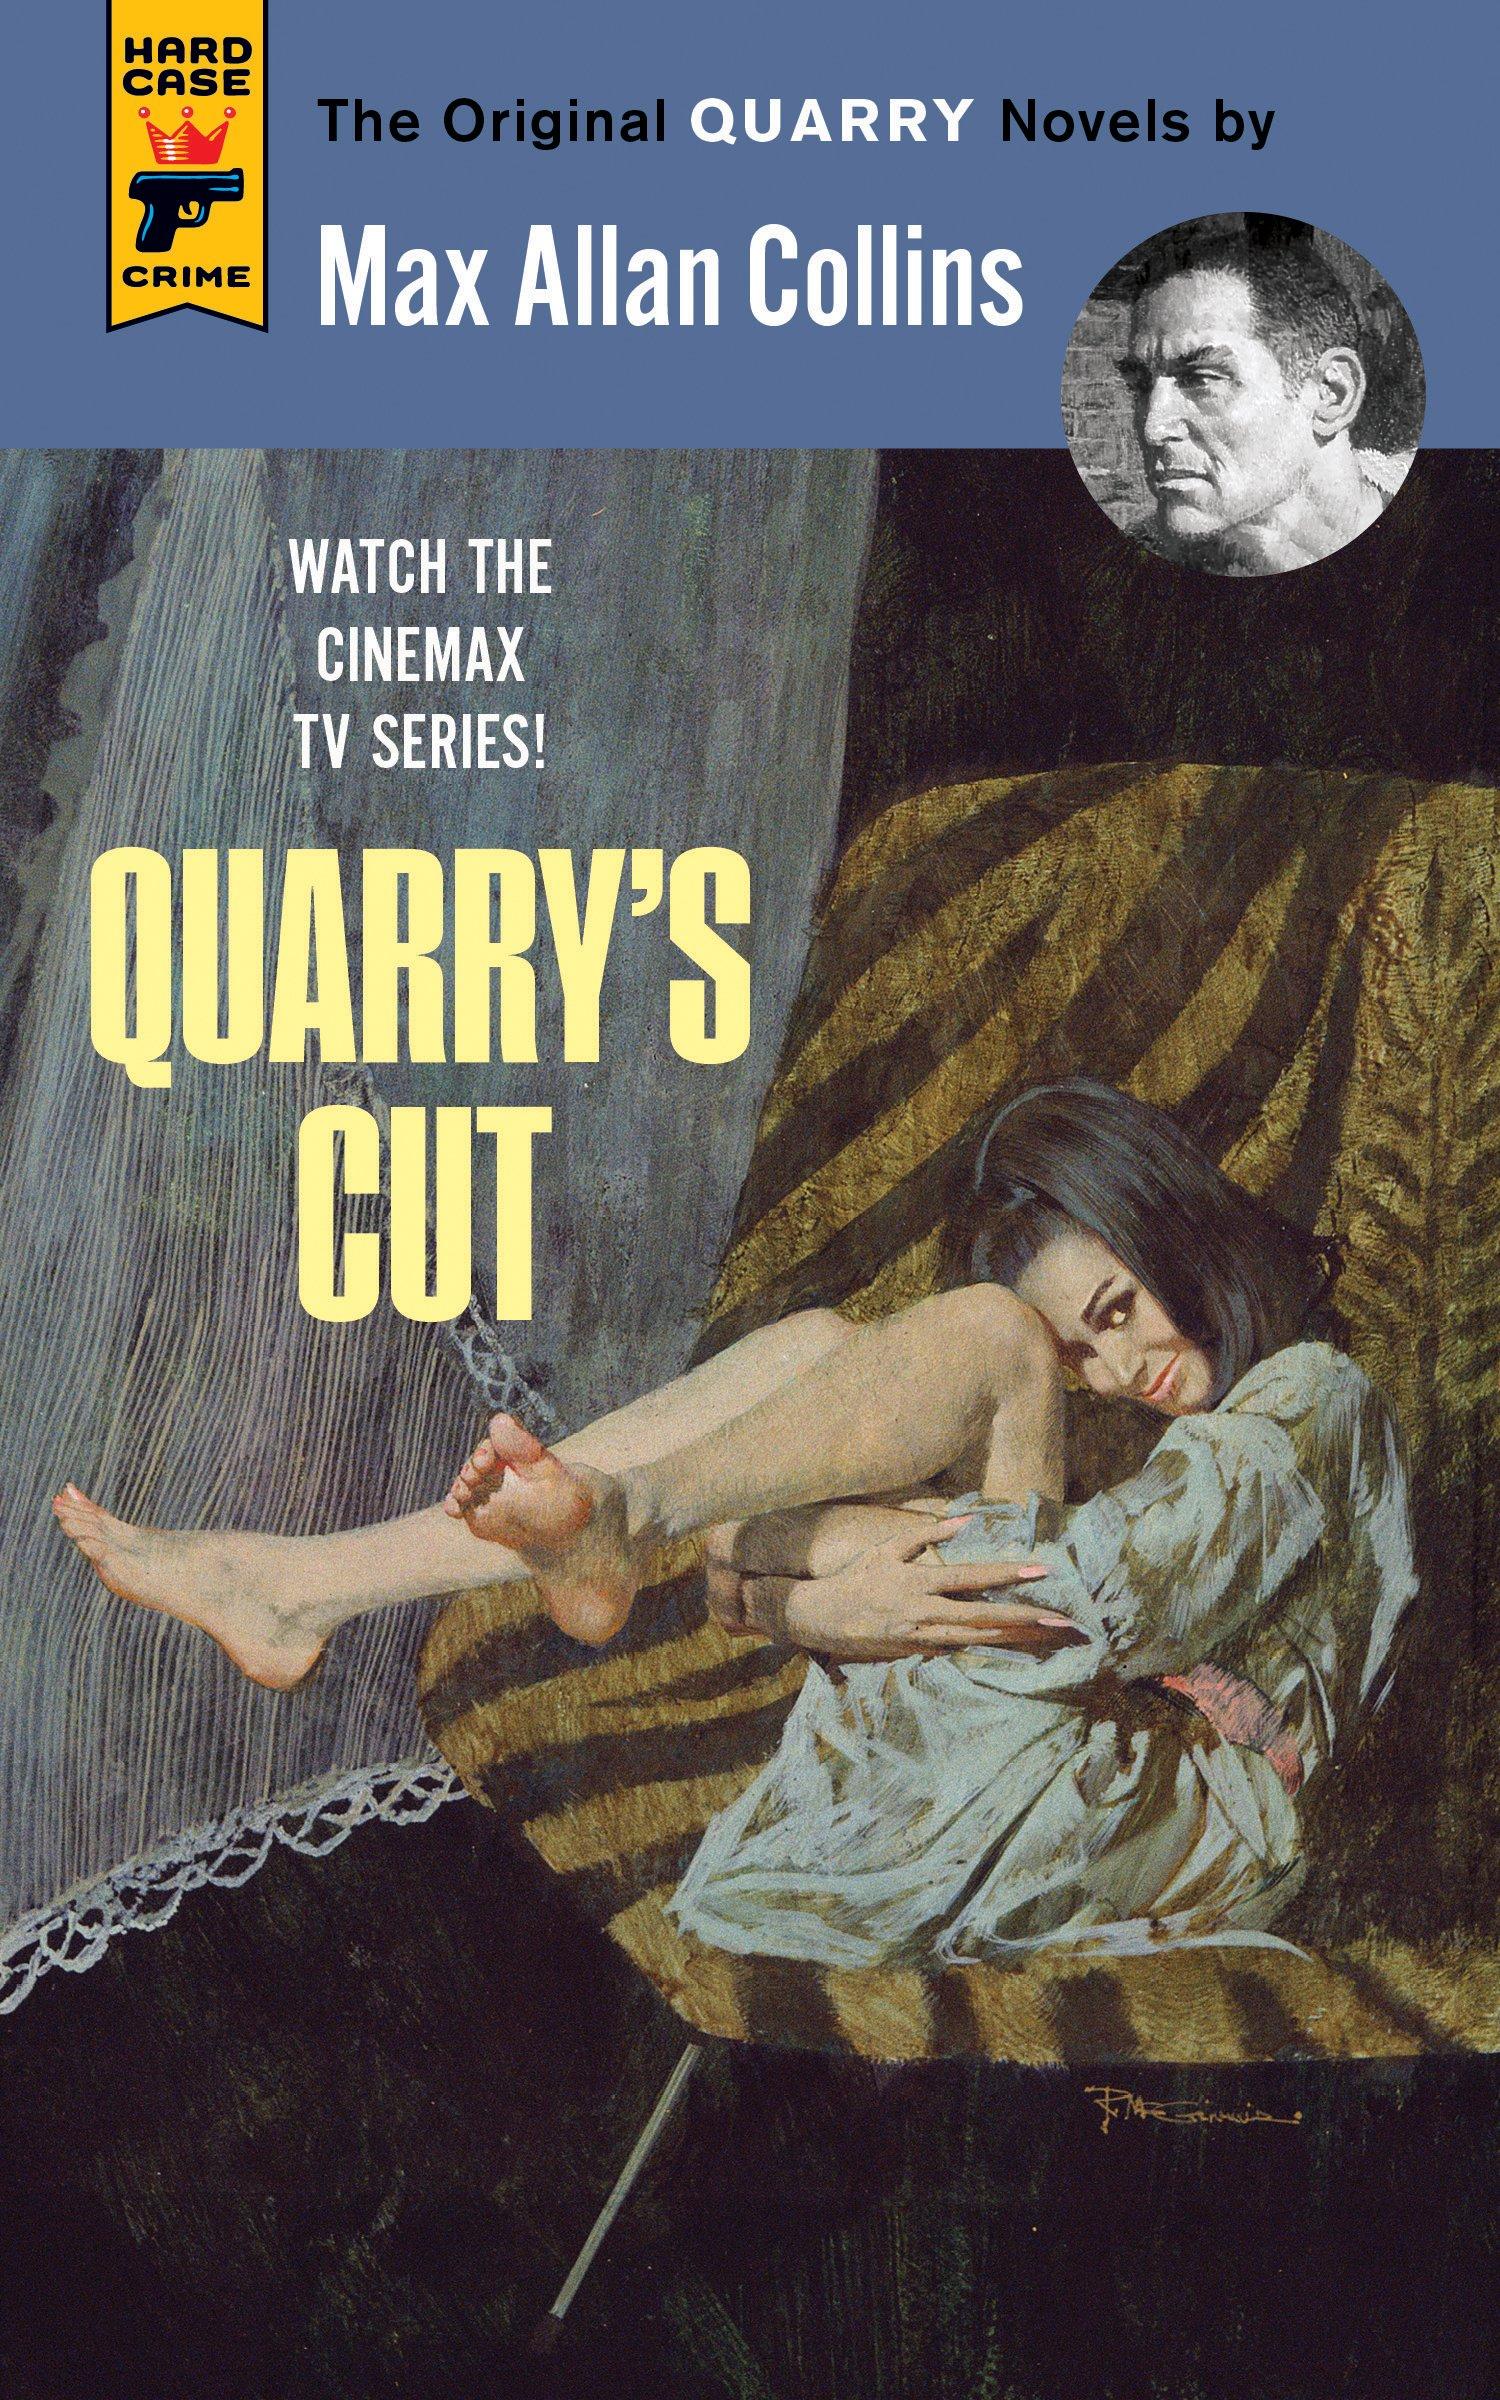 Amazon.com: Quarry's Cut (9781783298891): Collins, Max Allan: Books